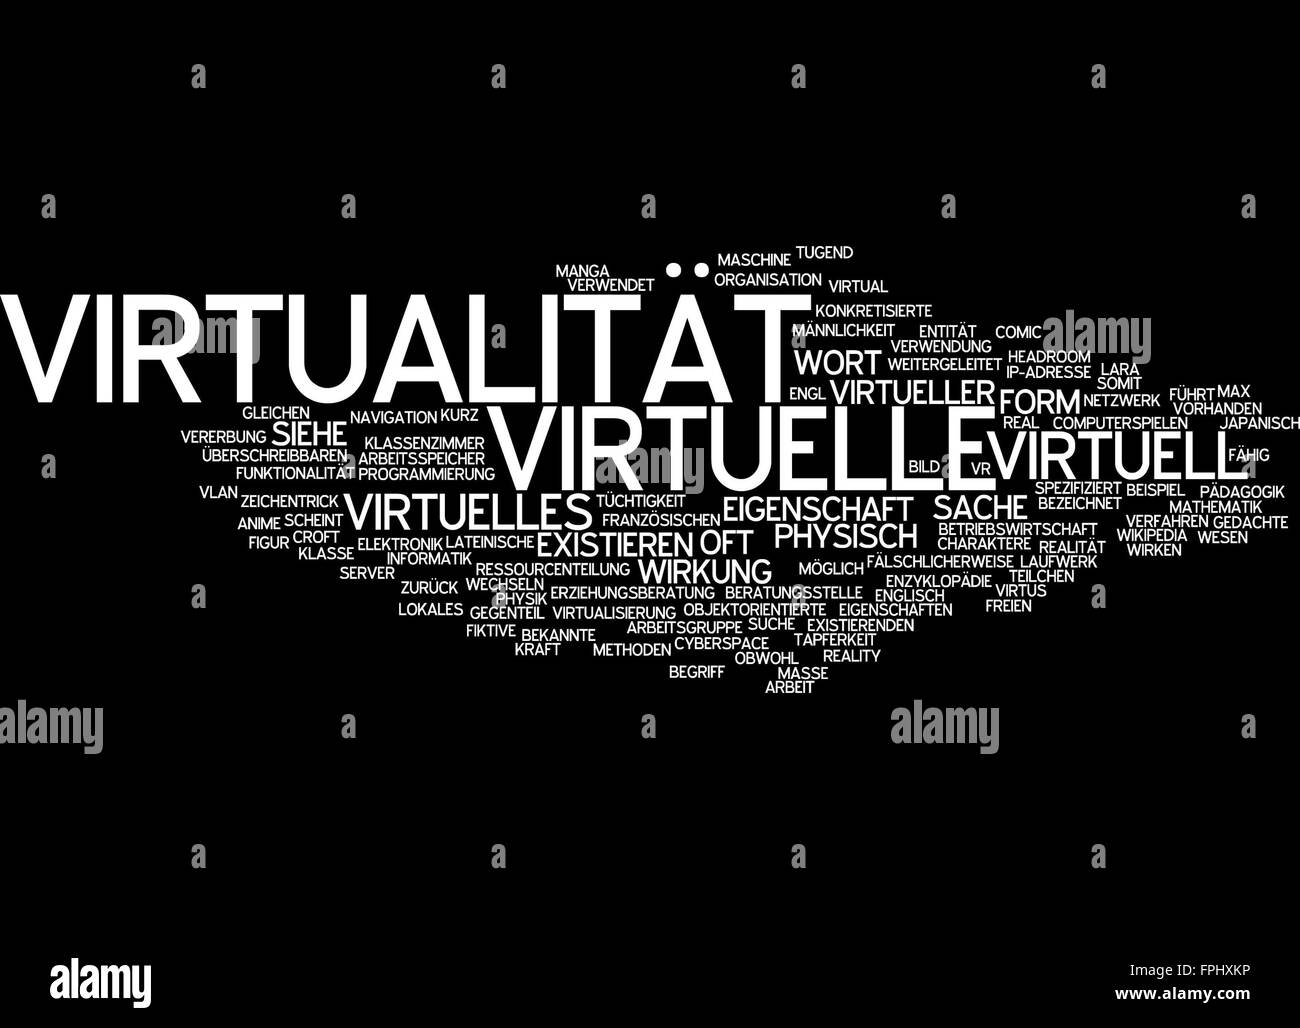 virtuell definition